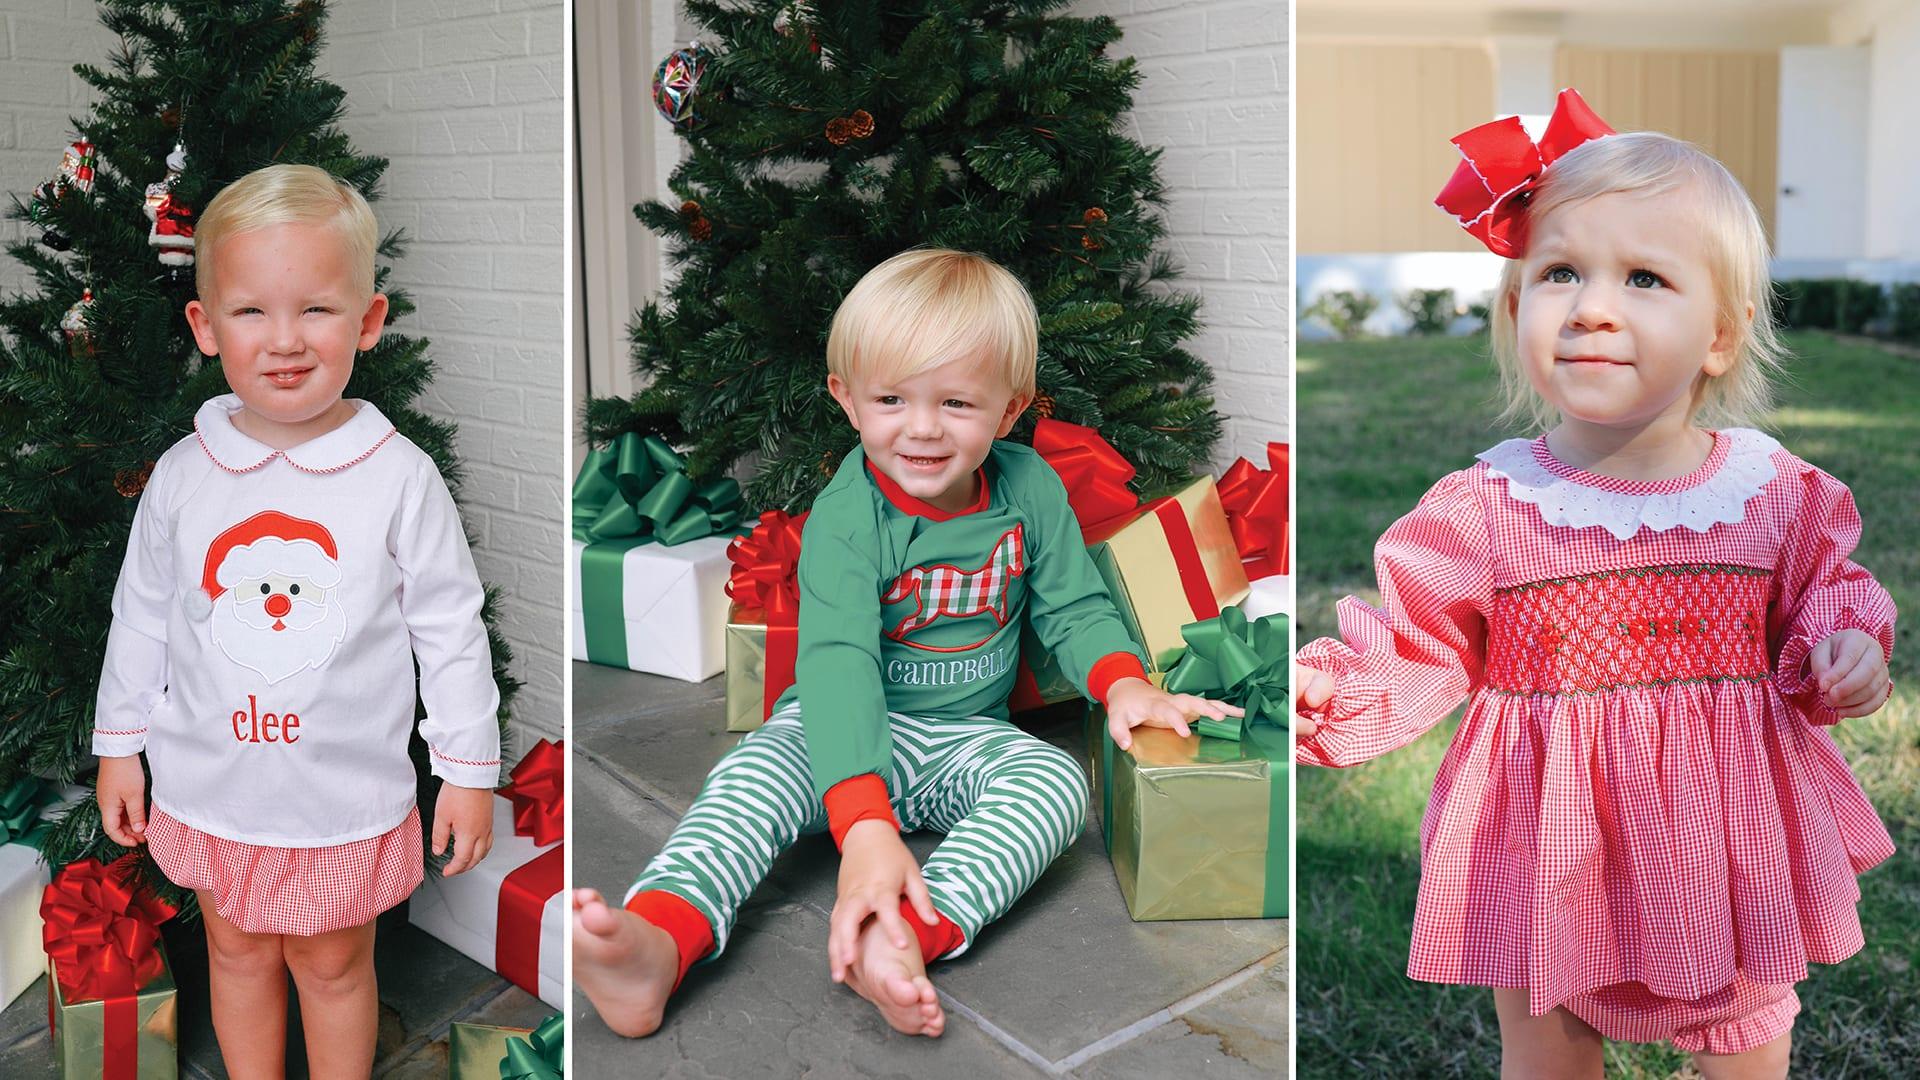 Children's Christmas Clothing